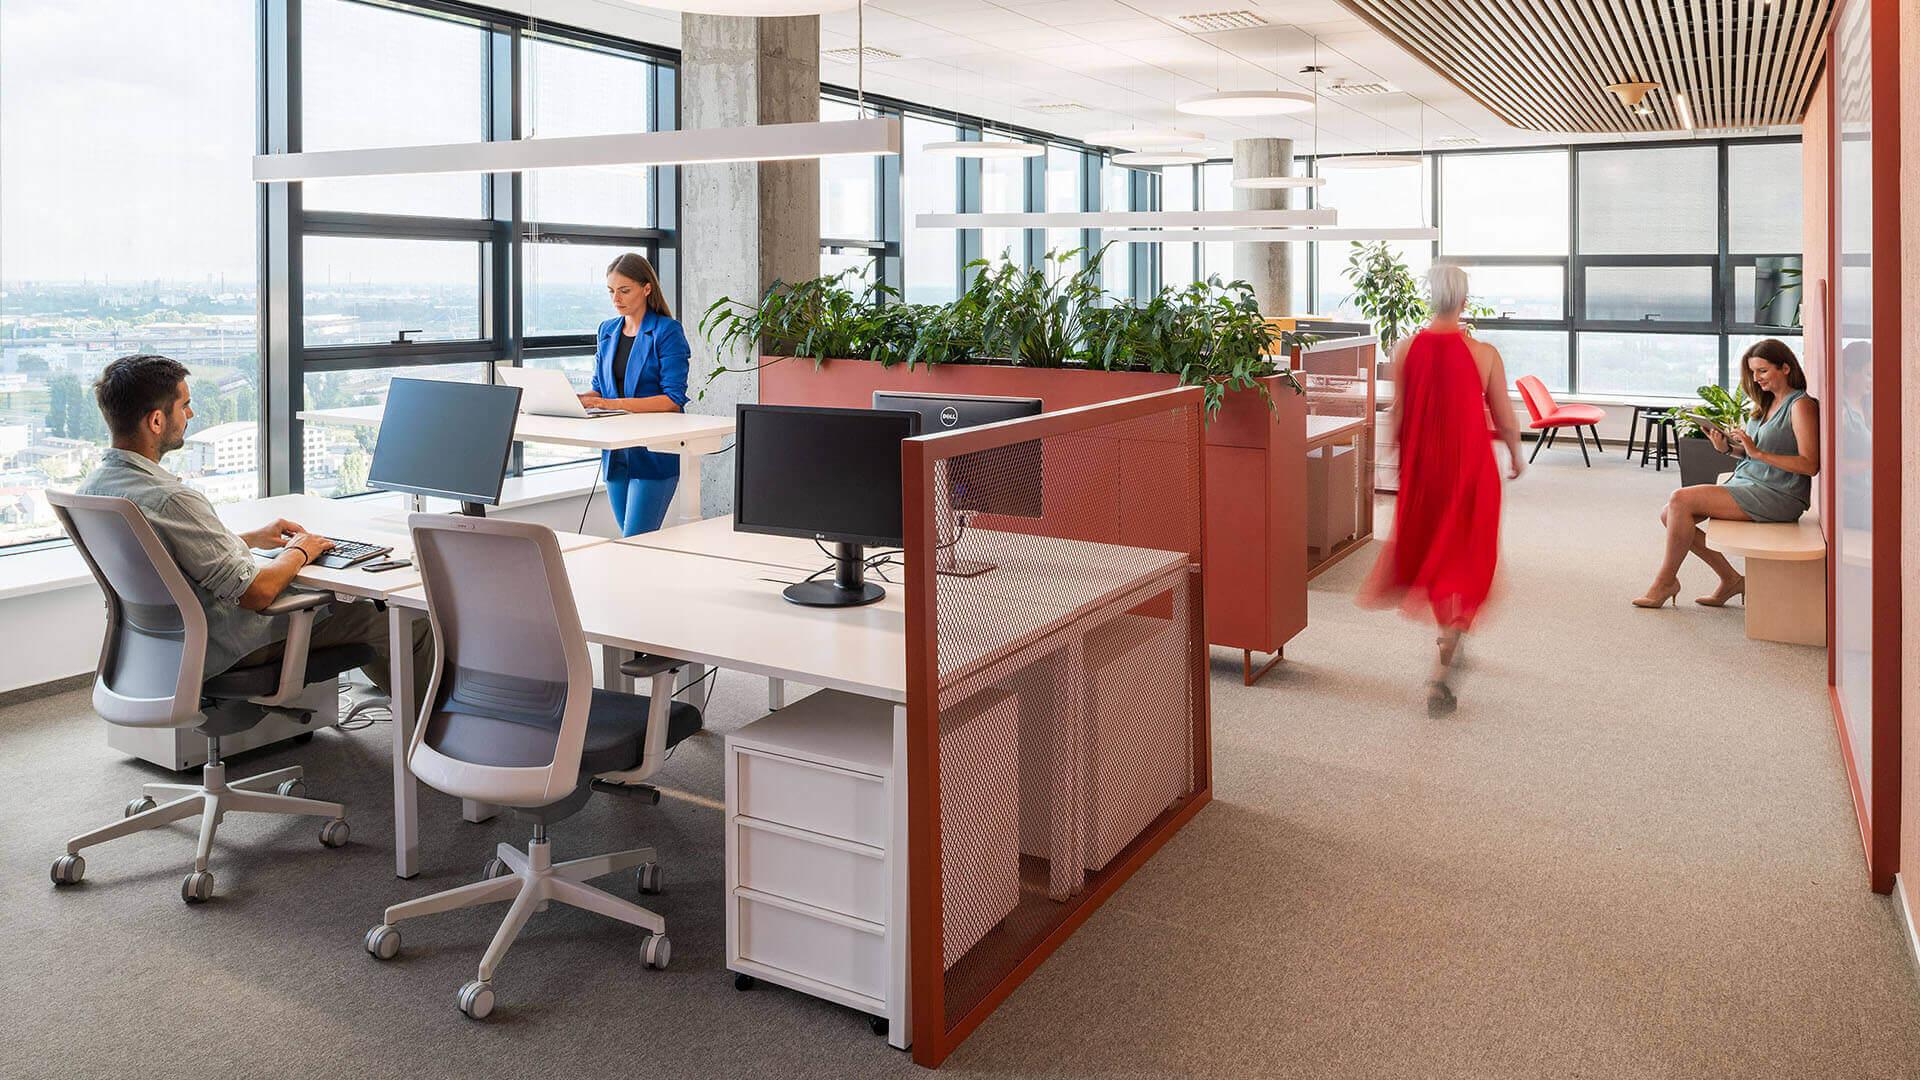 Resco_fixed workstations